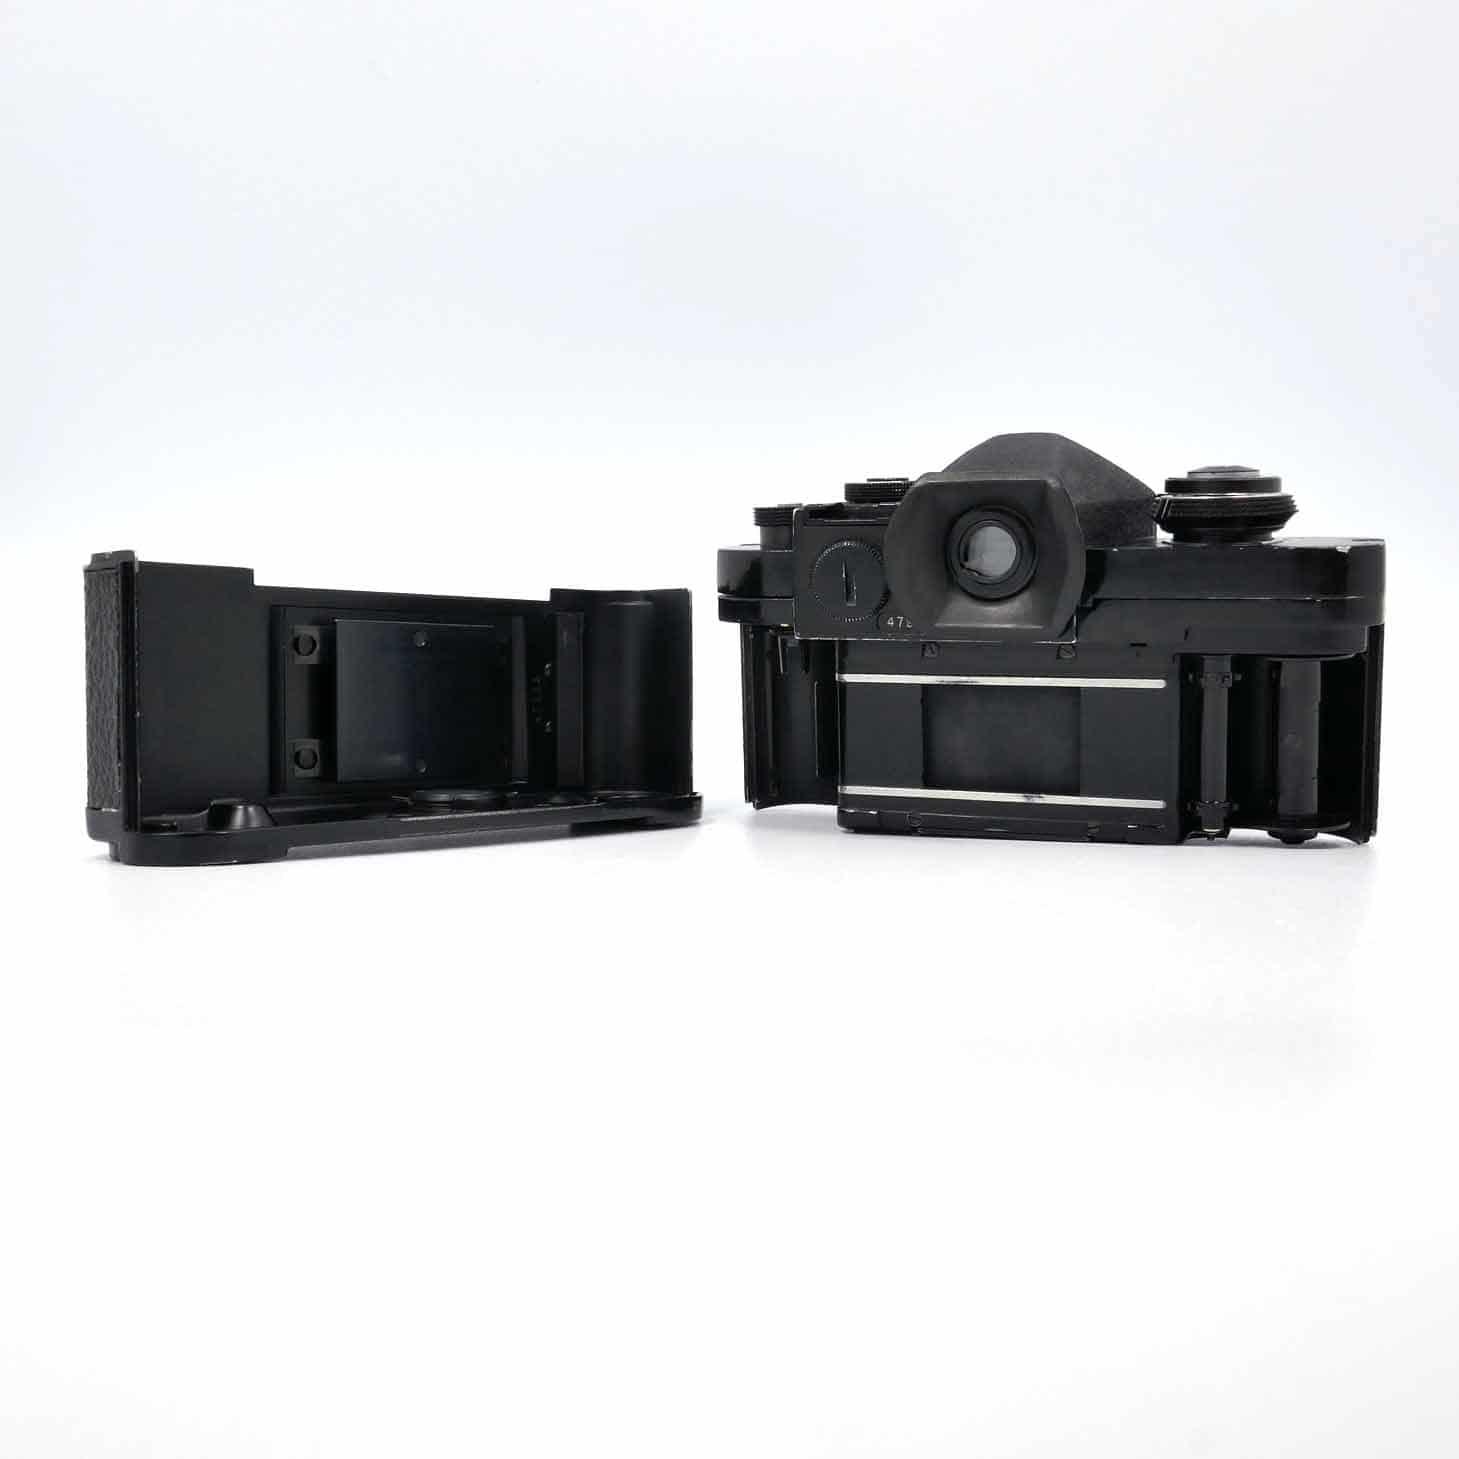 clean-cameras-Alpa-9d-Body-black-05